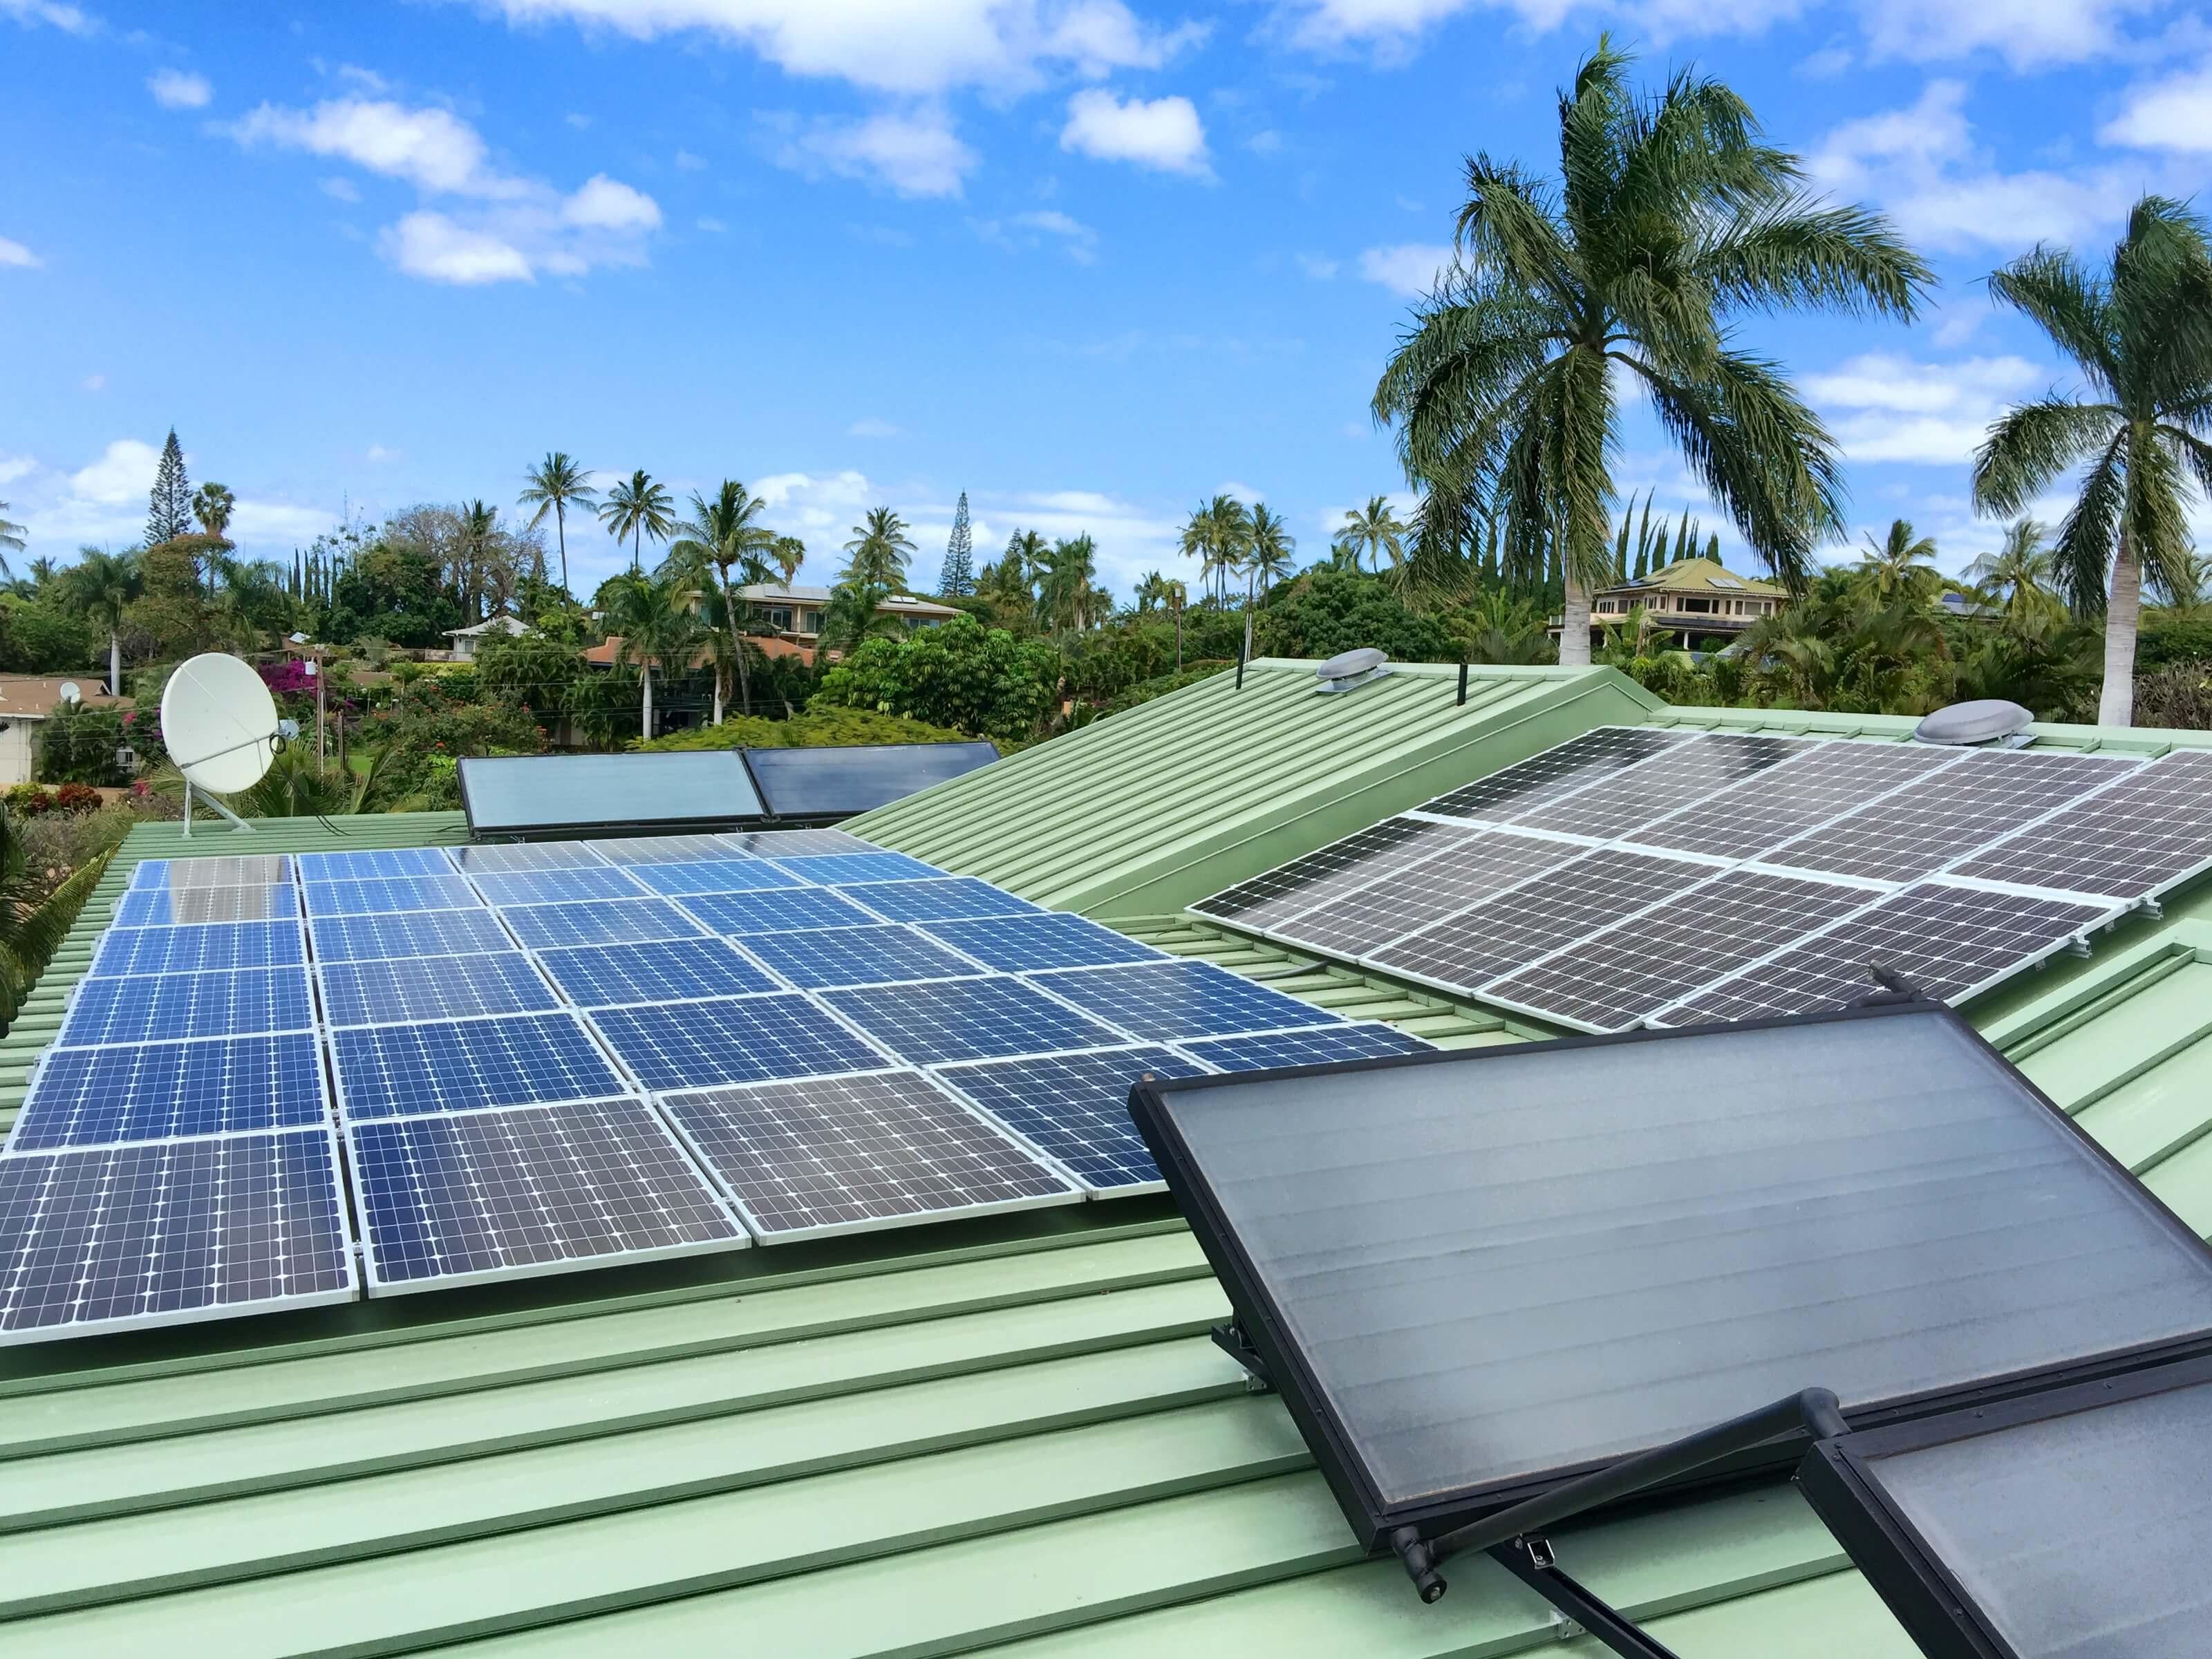 Maui Customer Self Supply - Premier Maui Solar Company